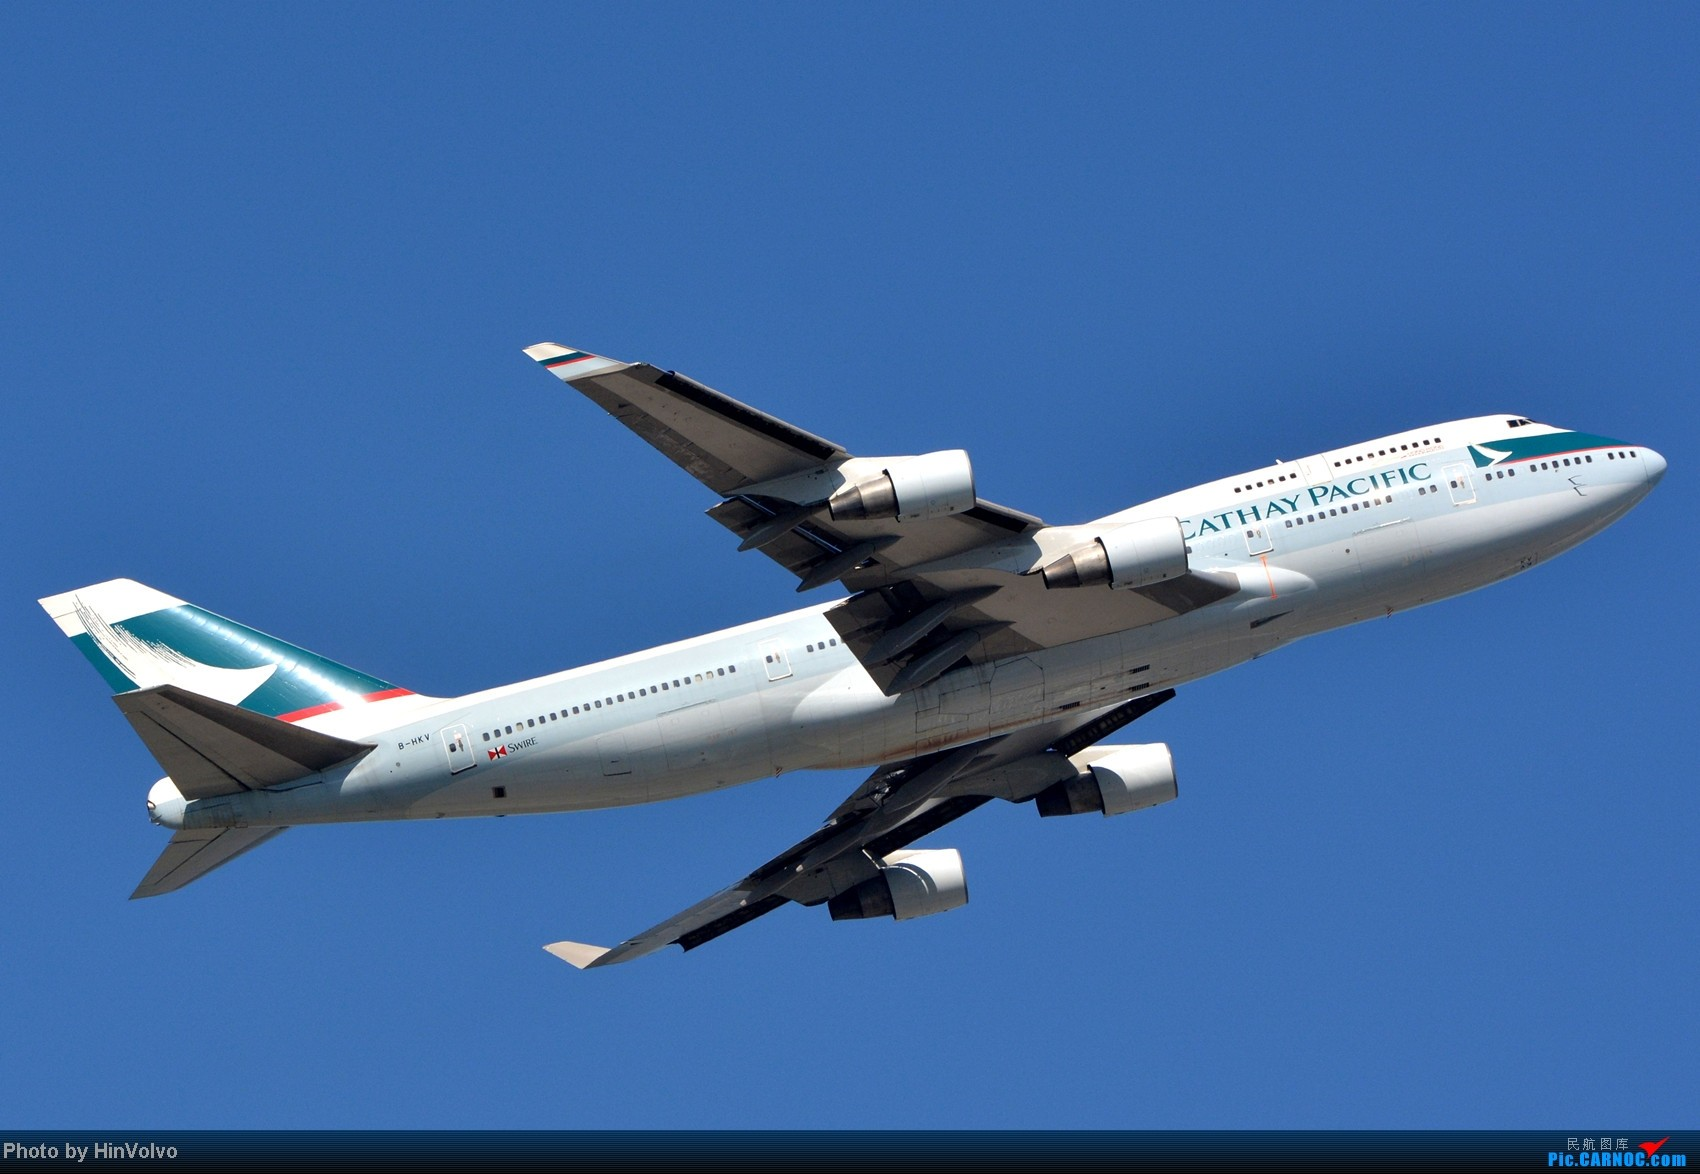 Re:[原创]~~~~多圖系列~~~HKG,早上好!寒冷的天氣出發前往機場拍到中午。 BOEING 747-400 B-HKV 中国香港赤鱲角机场